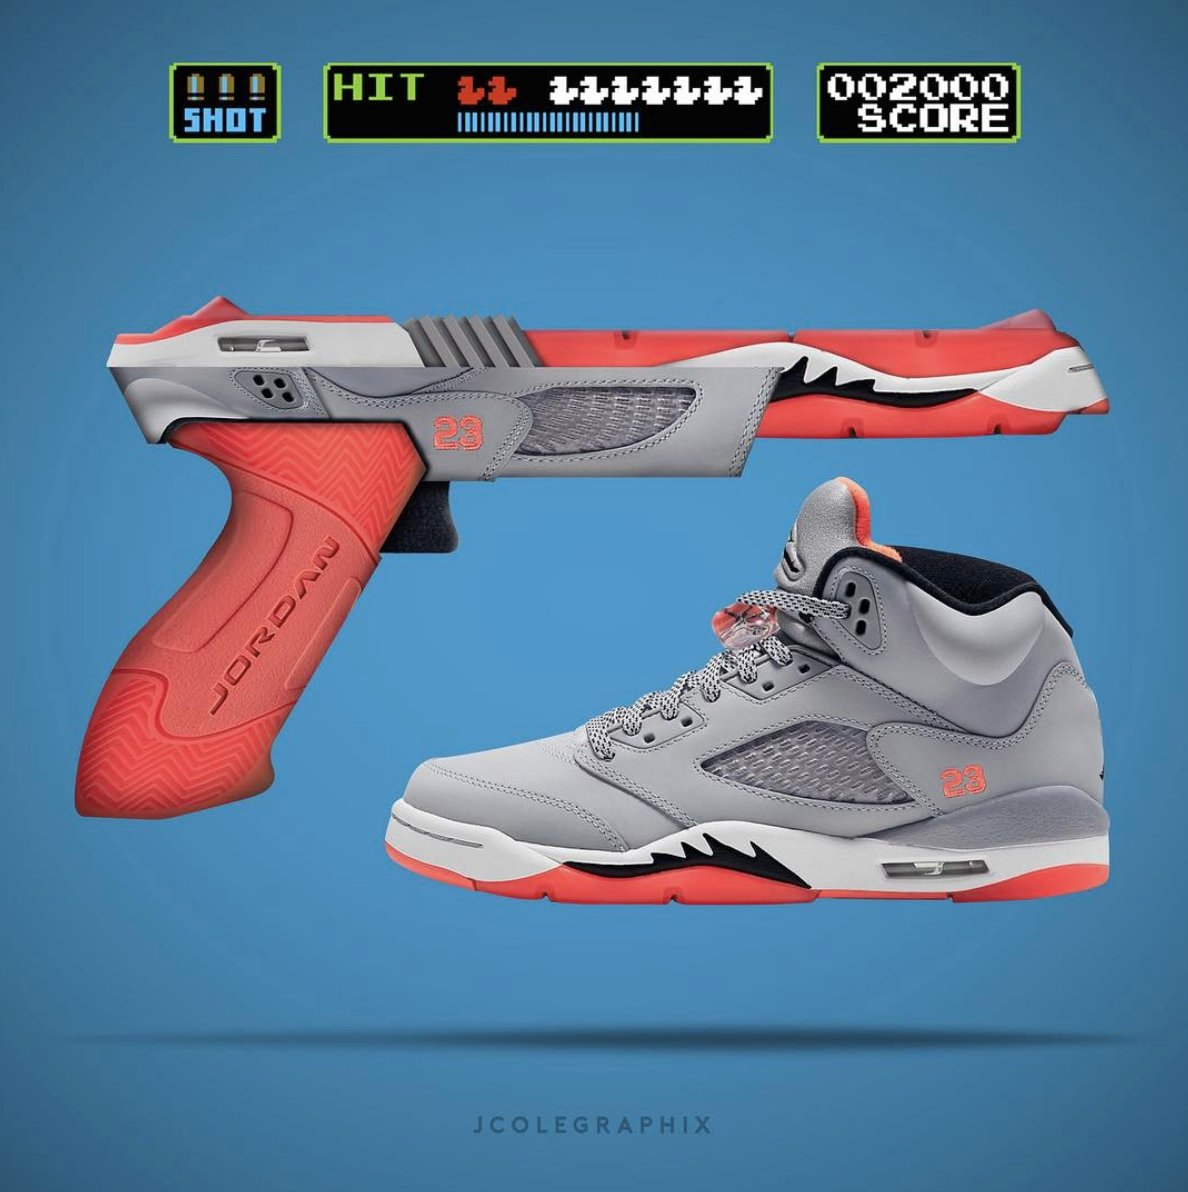 Culture x Chaussures   Les Mash-Ups furieux de @jcolegraphix  http:// graphicuntd.com/culture-x-chau ssures-les-mash-up-furieux-de-jeff-cole/ &nbsp; …  #sneakers #design <br>http://pic.twitter.com/ew6hKo9lm5